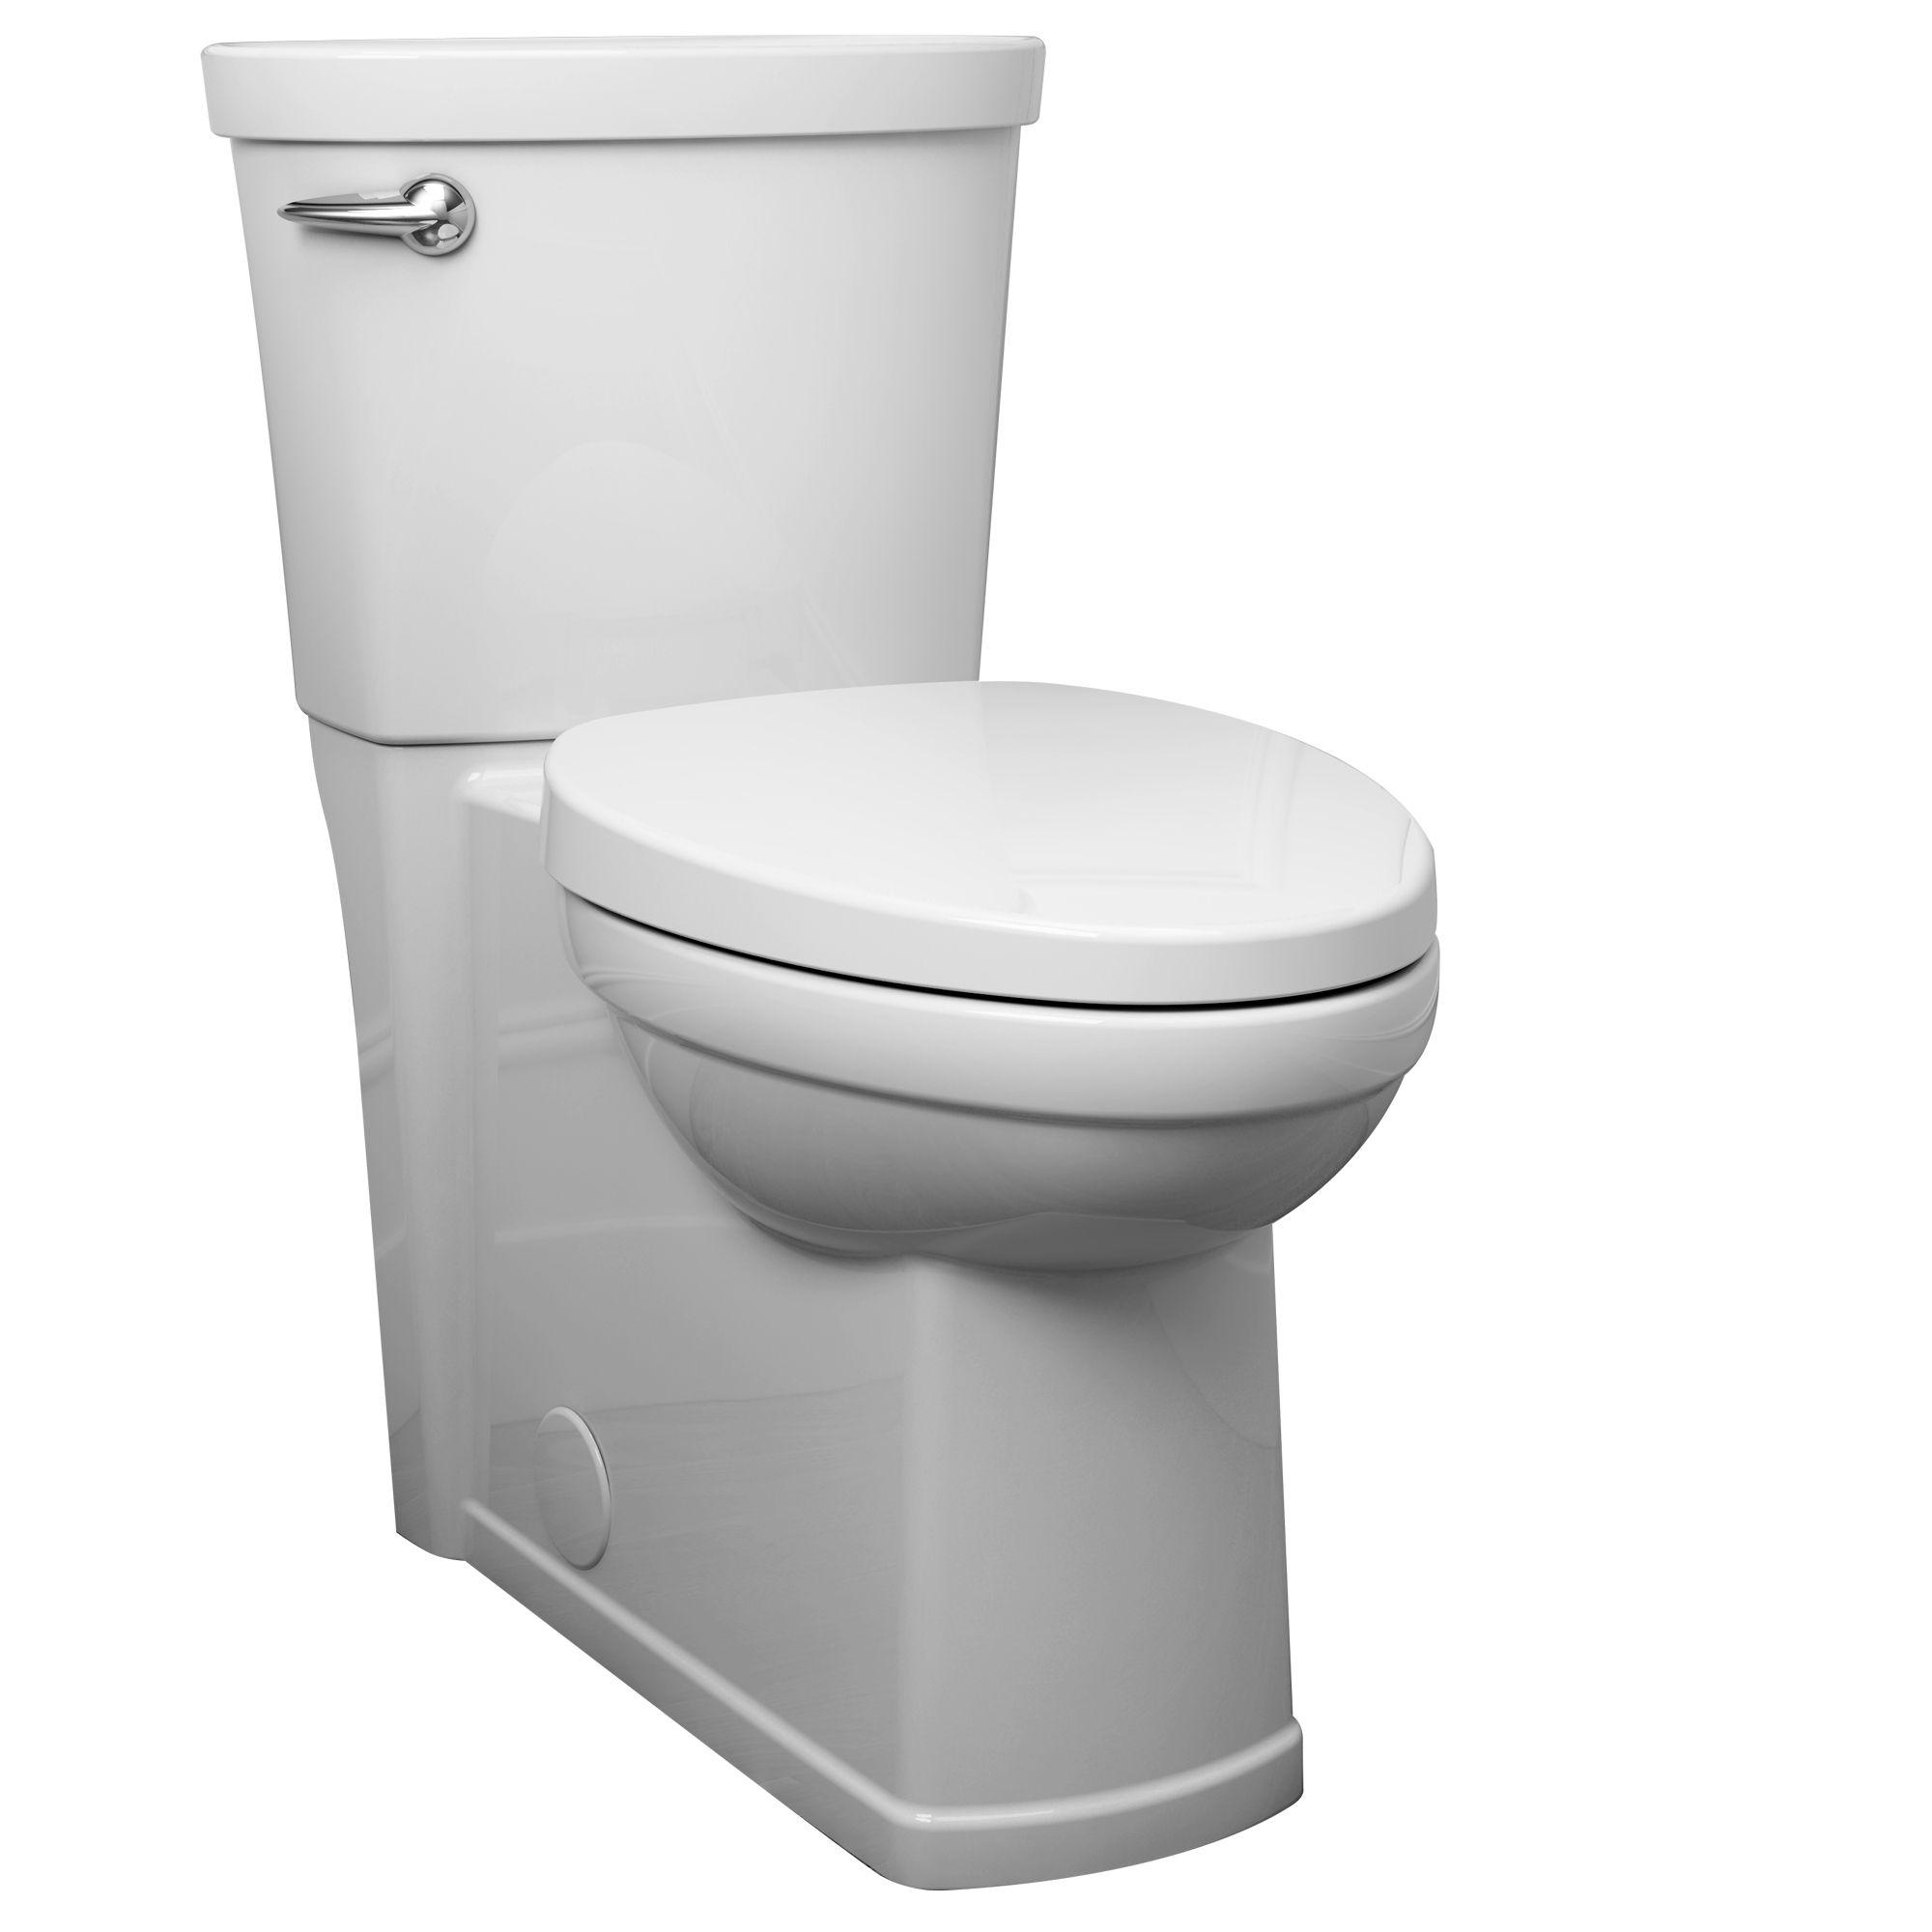 Cadet 3 Decor Right Height Elongated 1 28 Gpf Toilet Modern Toilet Toilet Installation Toilet